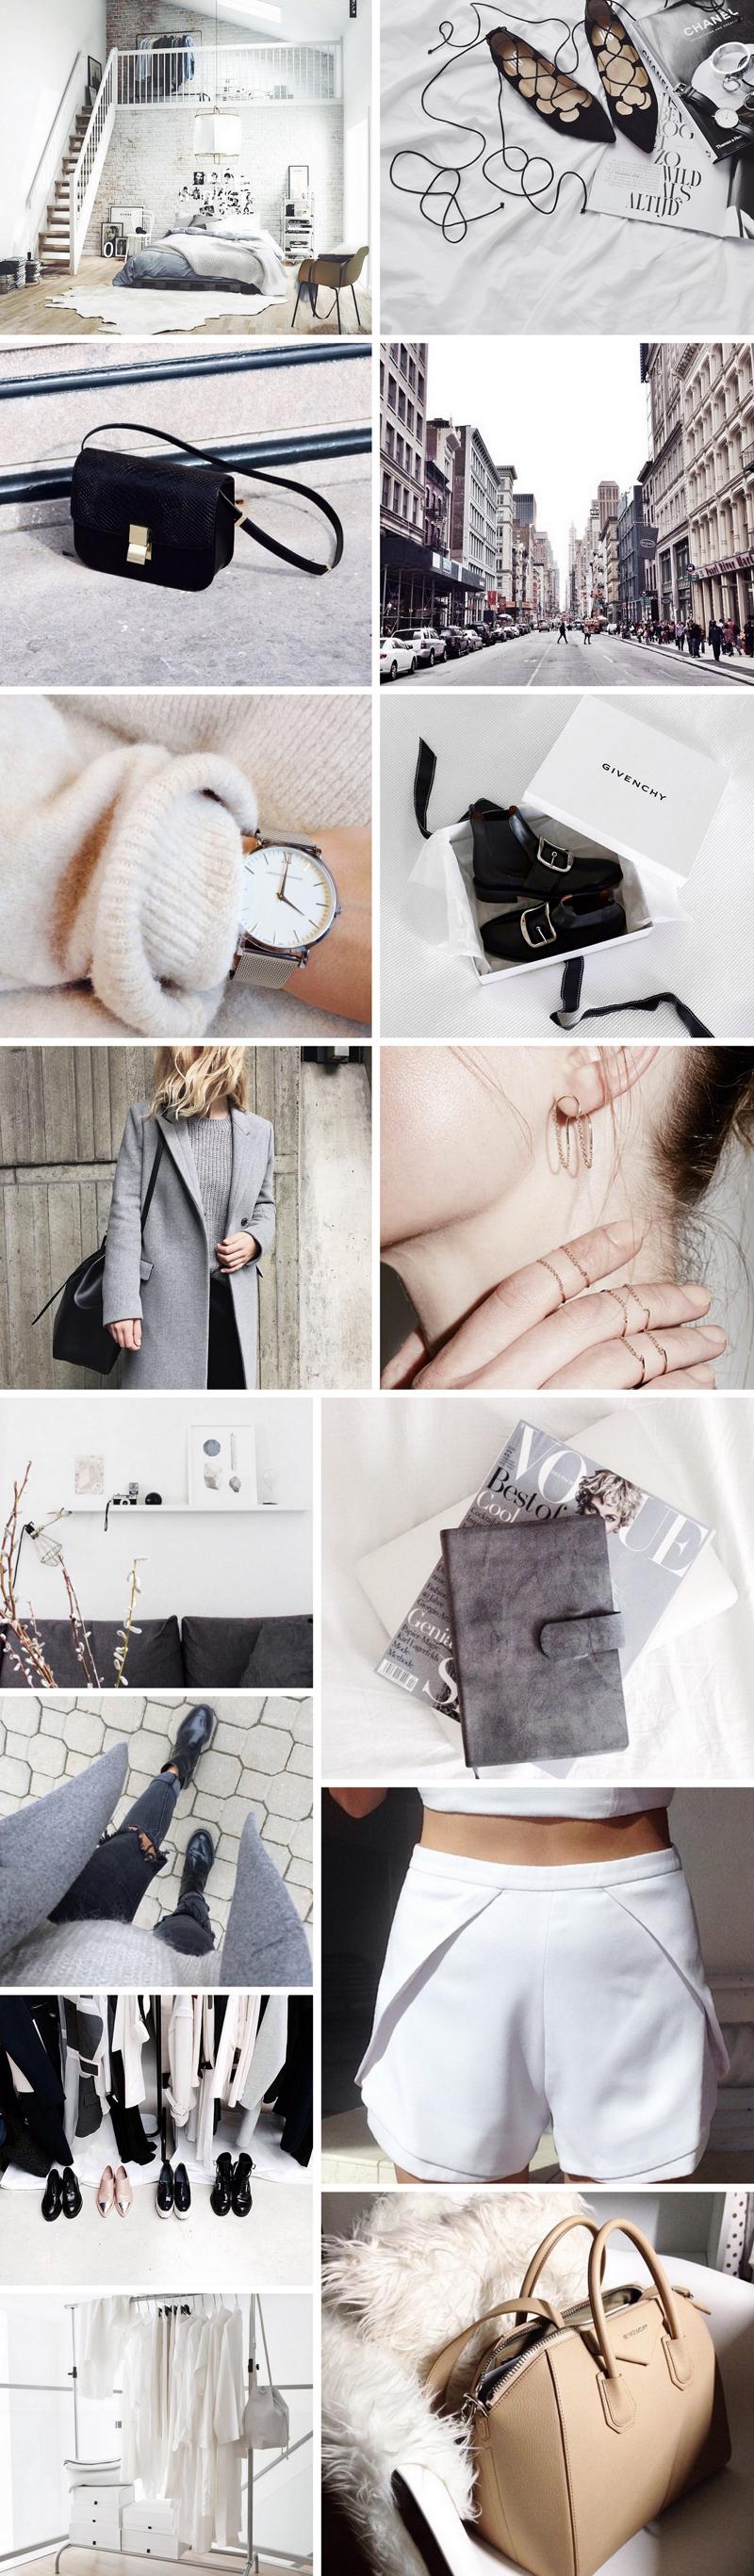 Stolen Inspiration | Kendra Alexandra | New Zealand Fashion Blogger | Mood Board Winter 2015